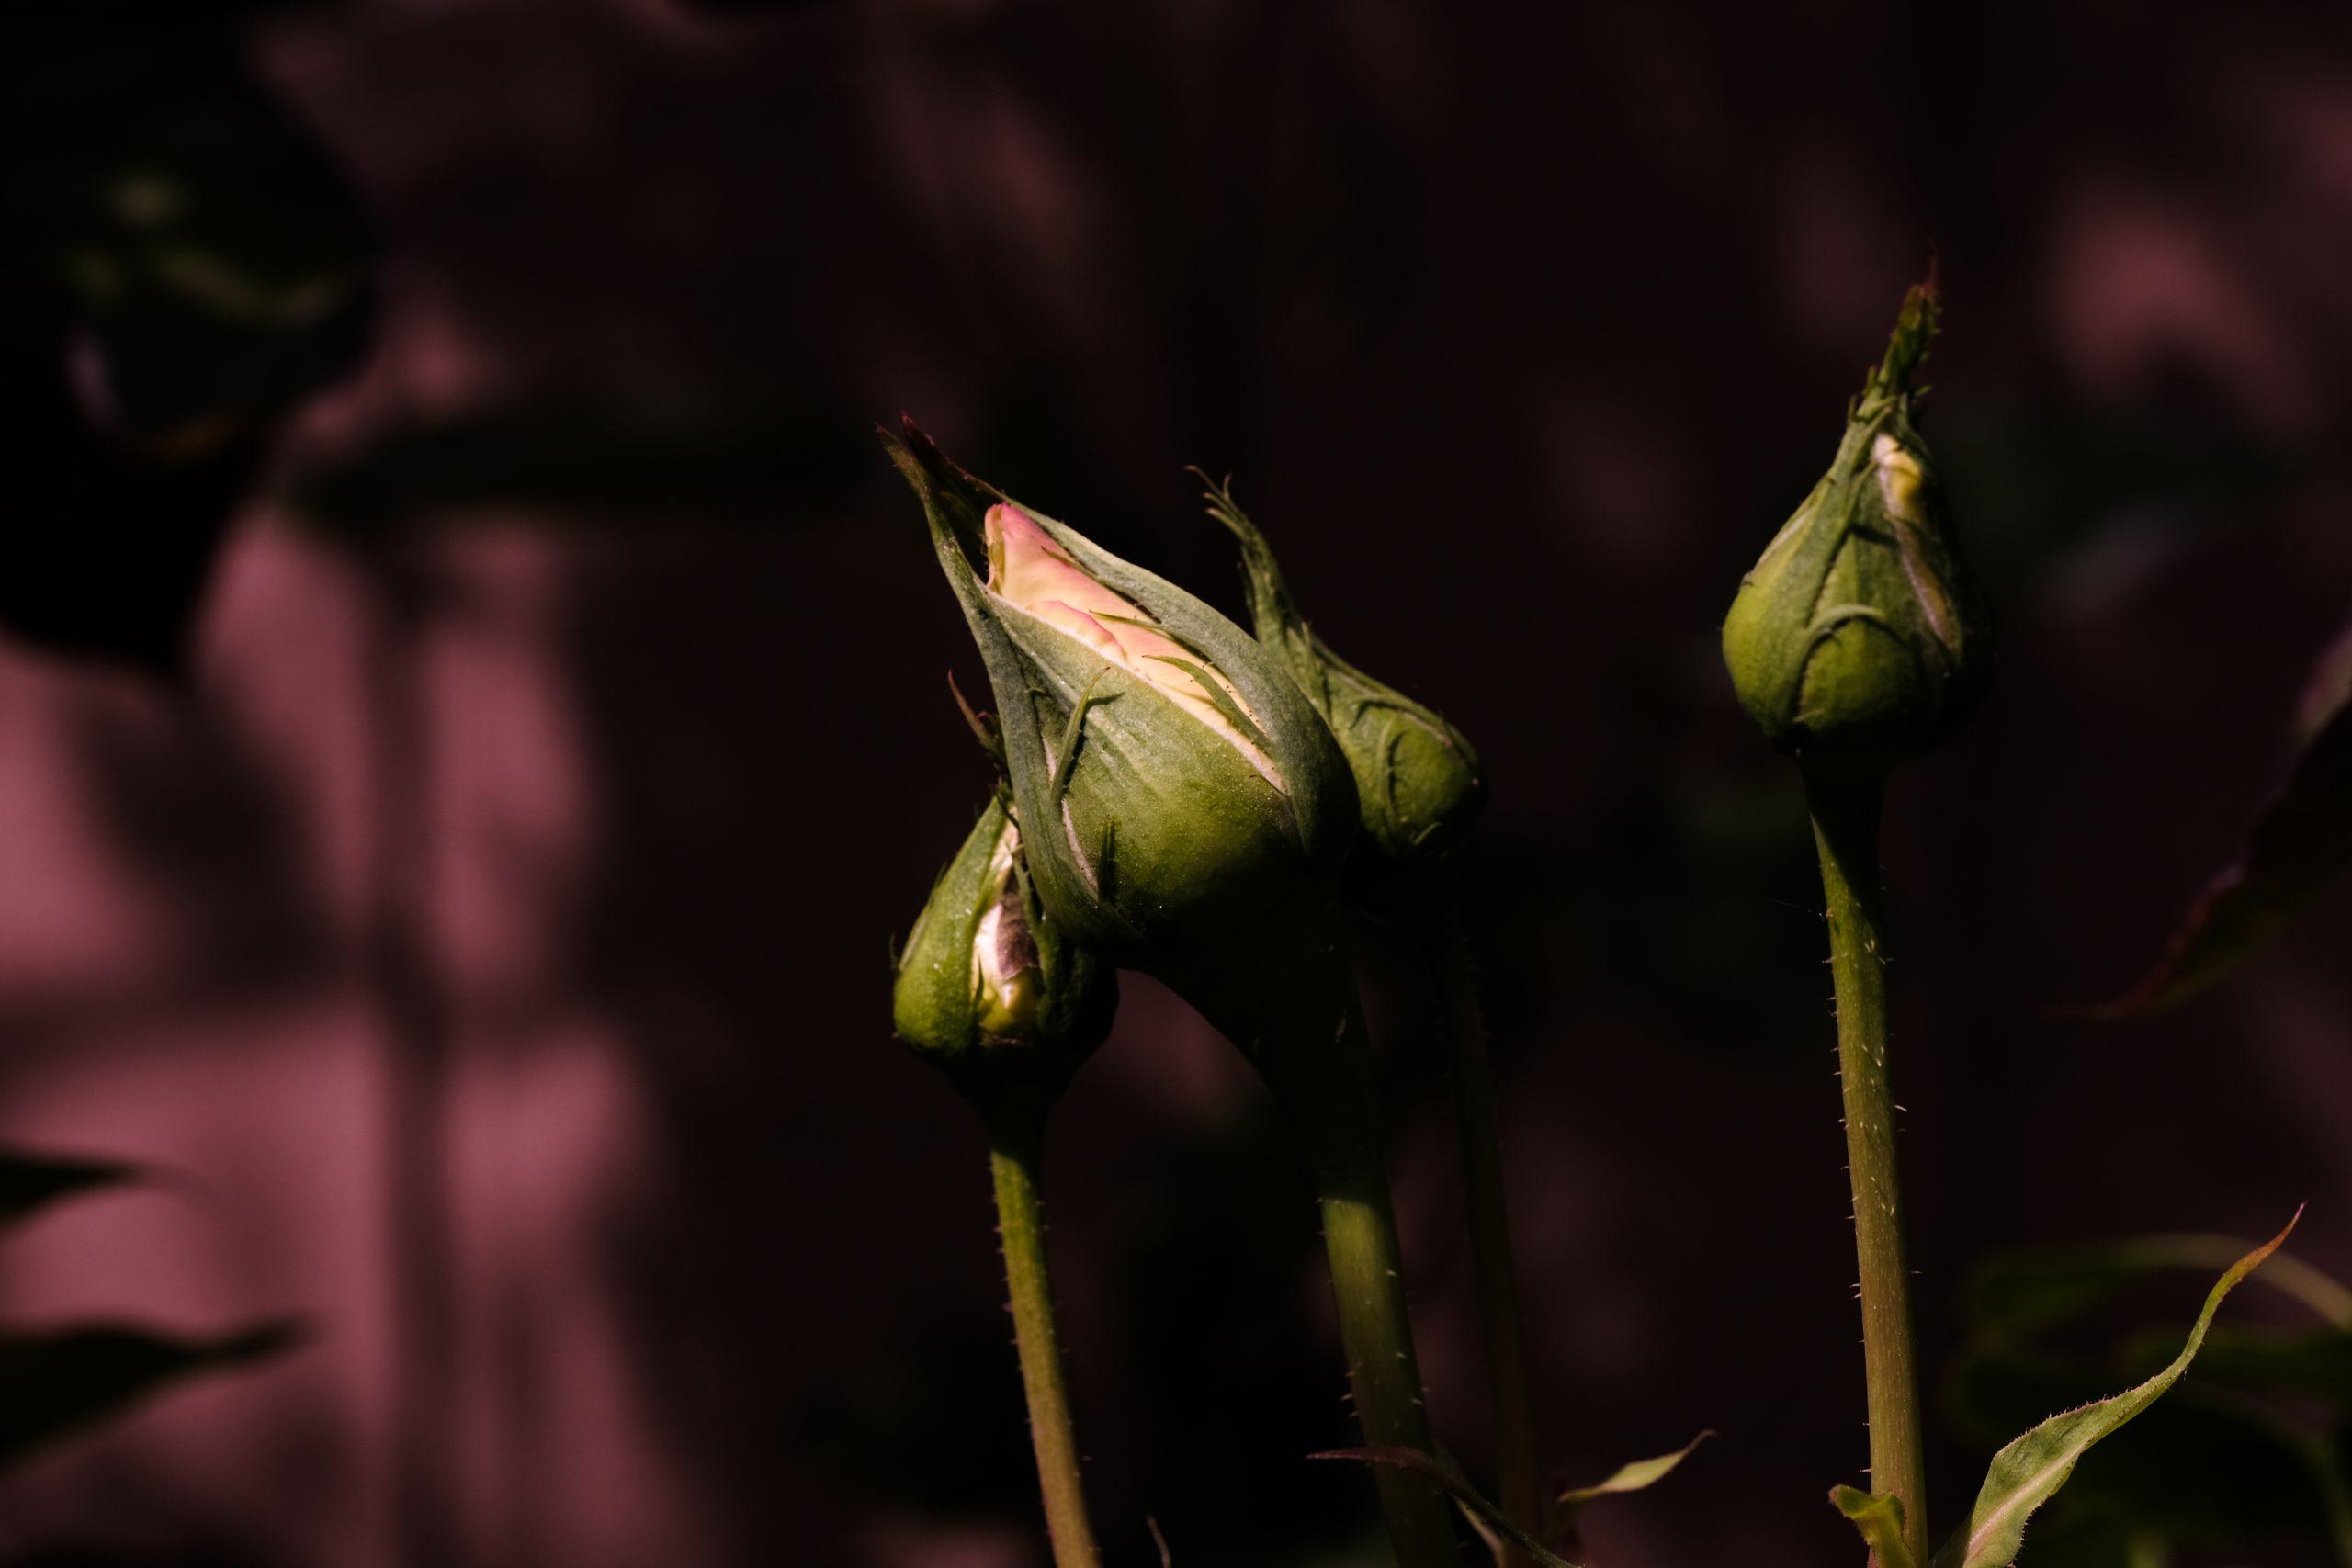 Roses_Oregon_3_May_2021 Copyright Steve J Davis